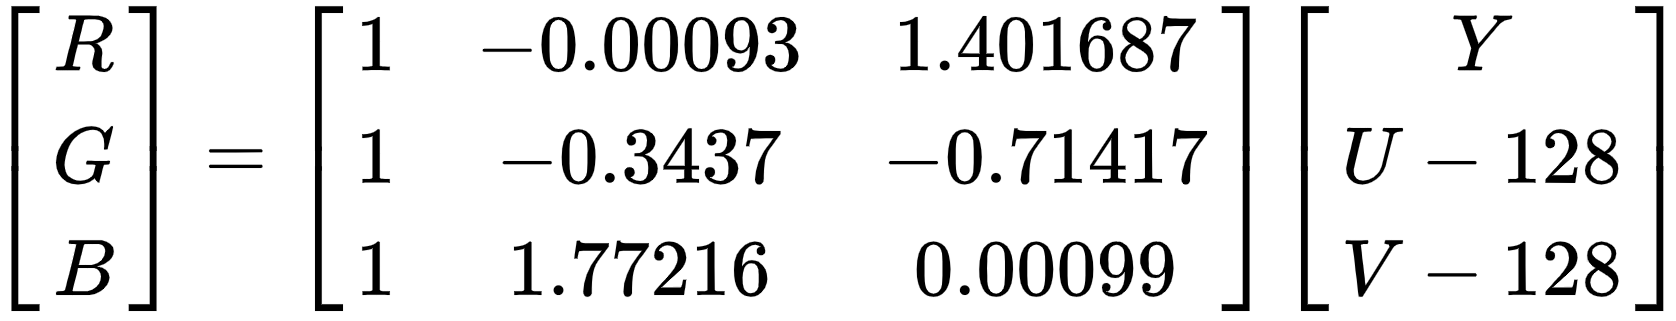 YUV 转 RGB 的转换矩阵